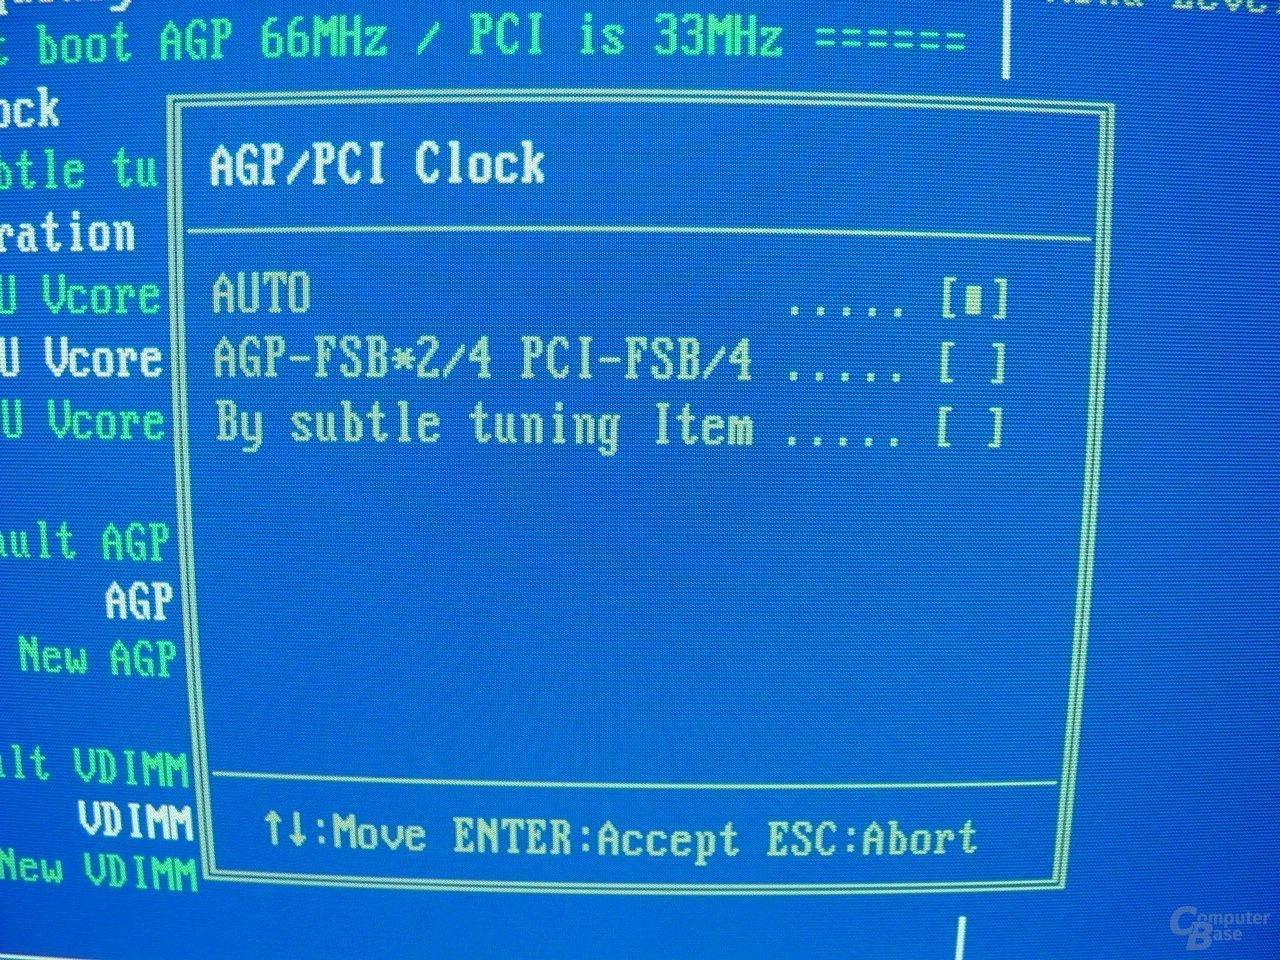 EP-4GEAEI - BIOS - AGP-PCI-Clock